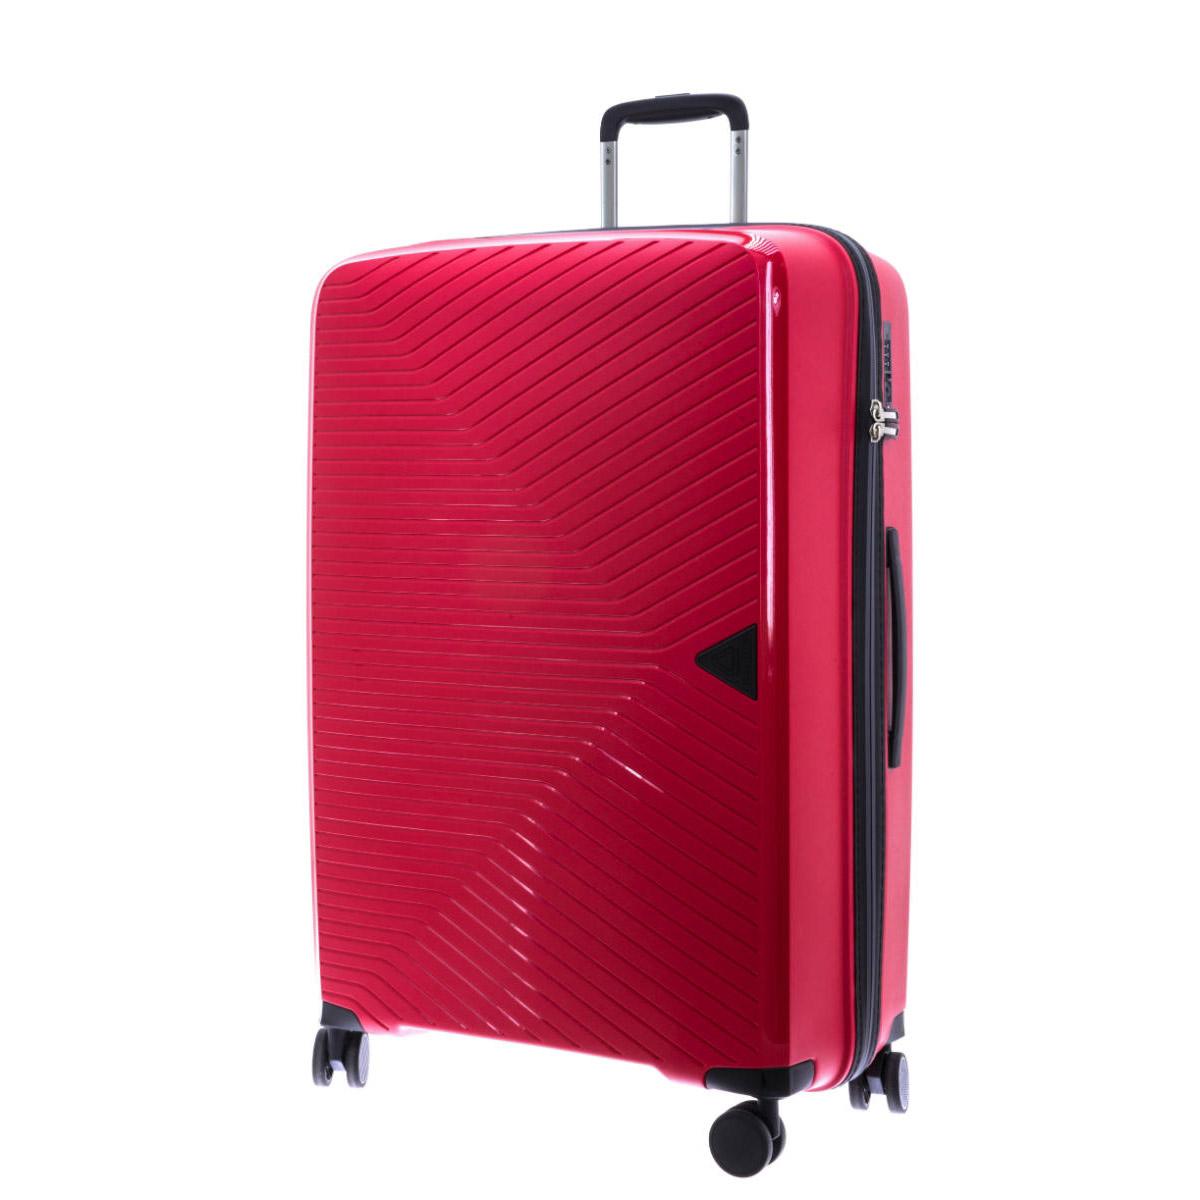 Valise trolley coque polypropylène \'Davidt\'s\' rouge - 77x53x32 cm - [Q9476]